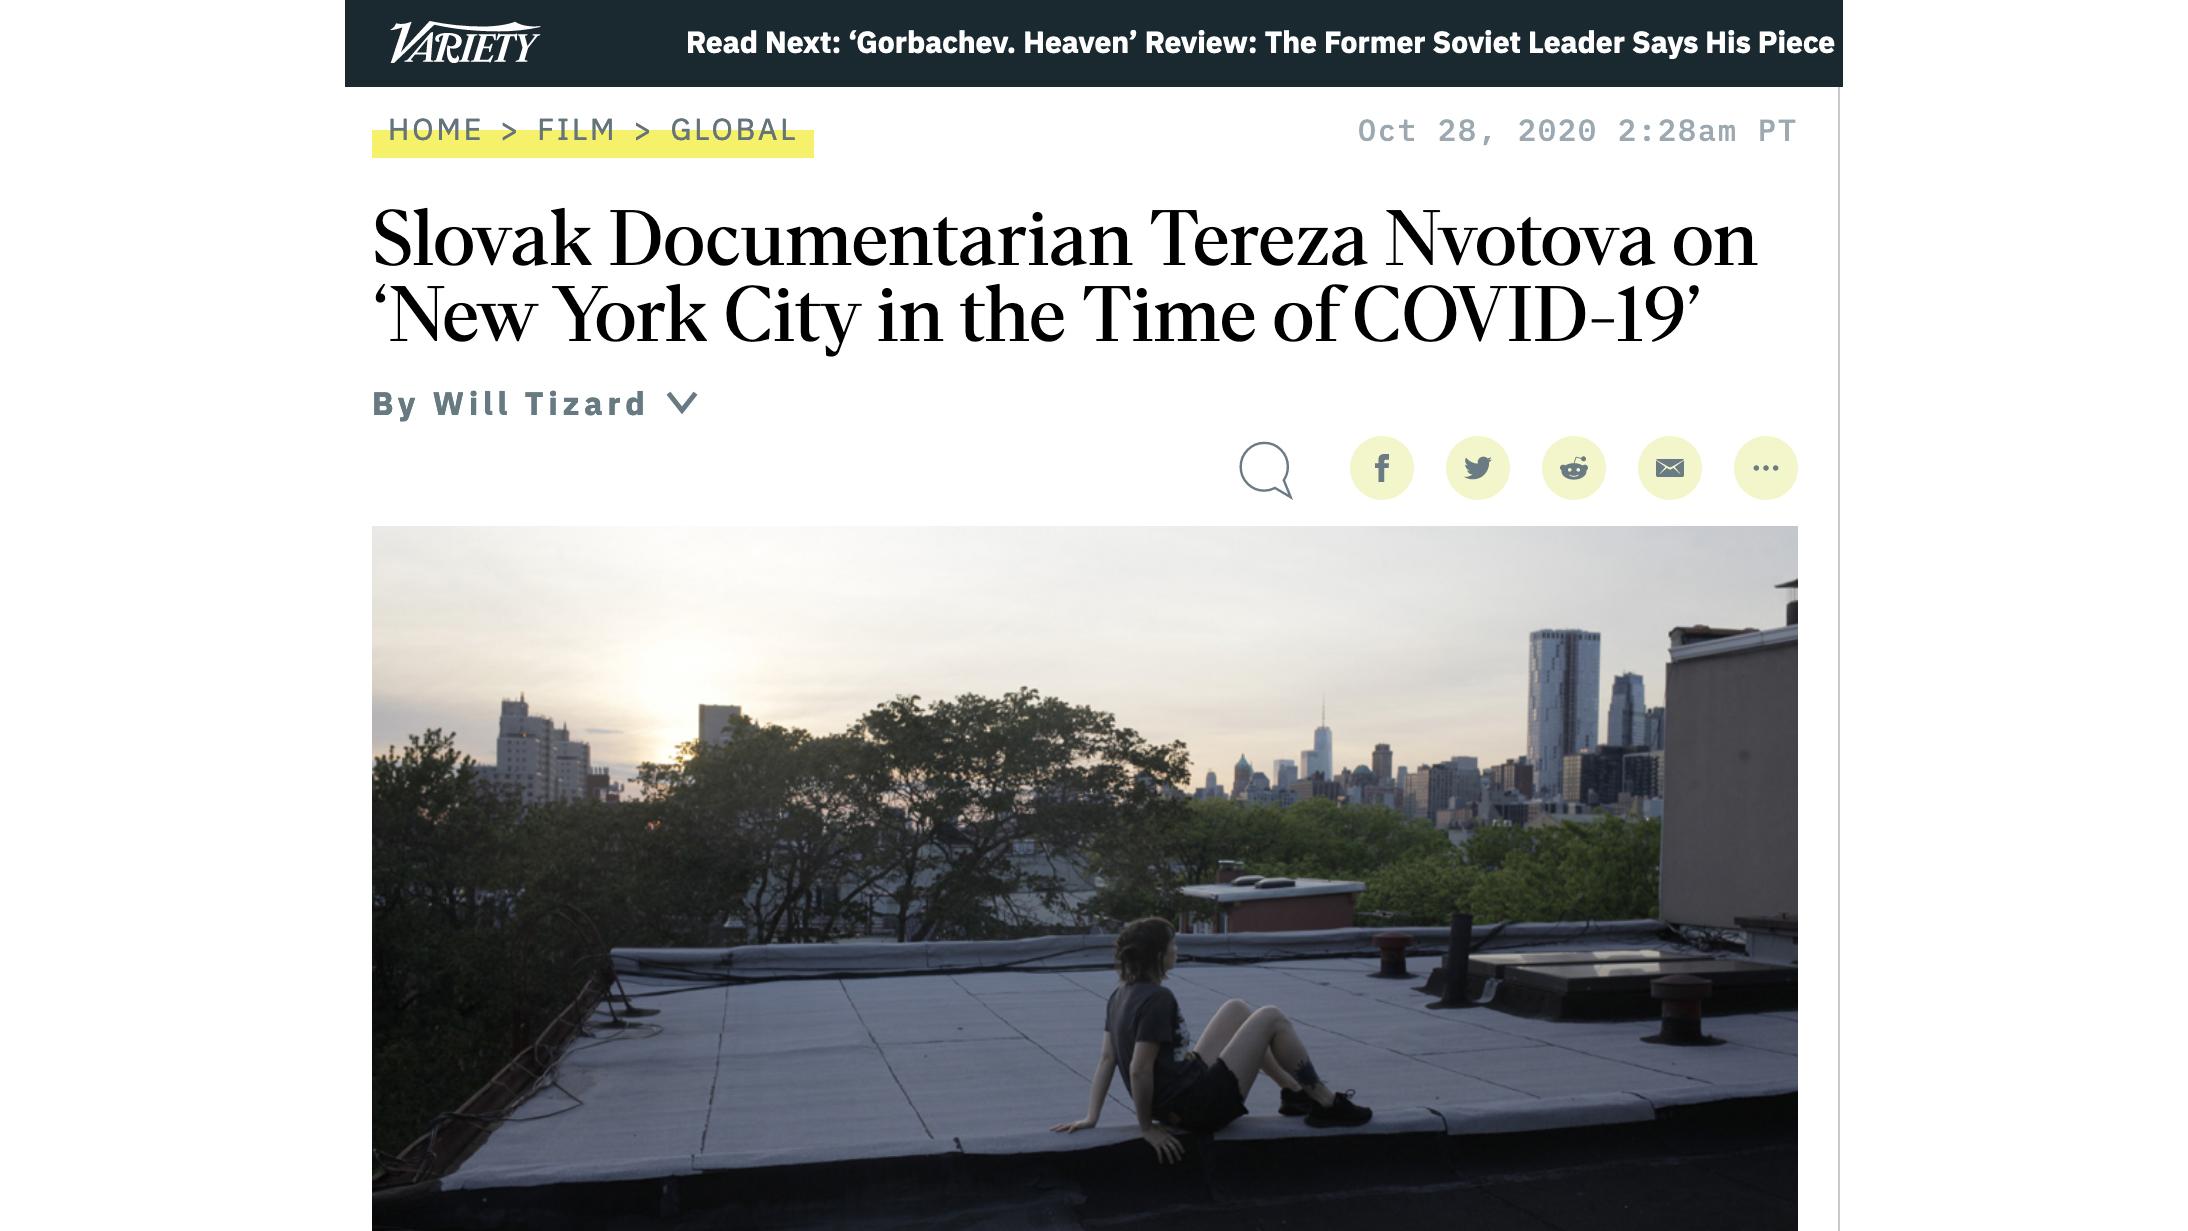 VARIETY: Slovak Documentarian Tereza Nvotova on 'New York City in the Time of COVID-19'